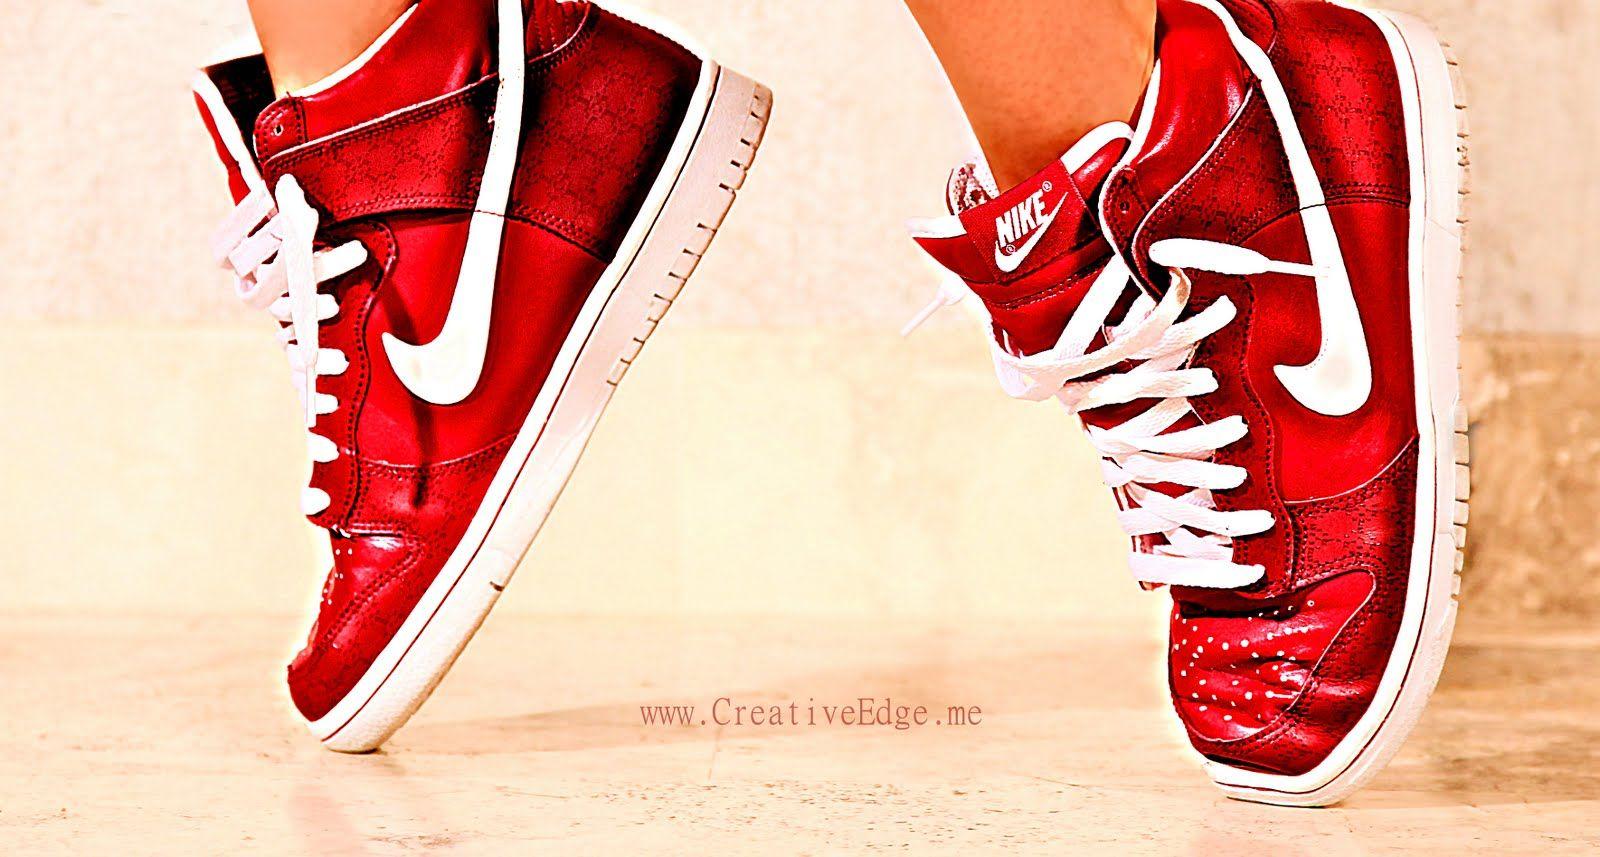 hip hop kicks | Nothing fresher than my Kicks | Nike dance